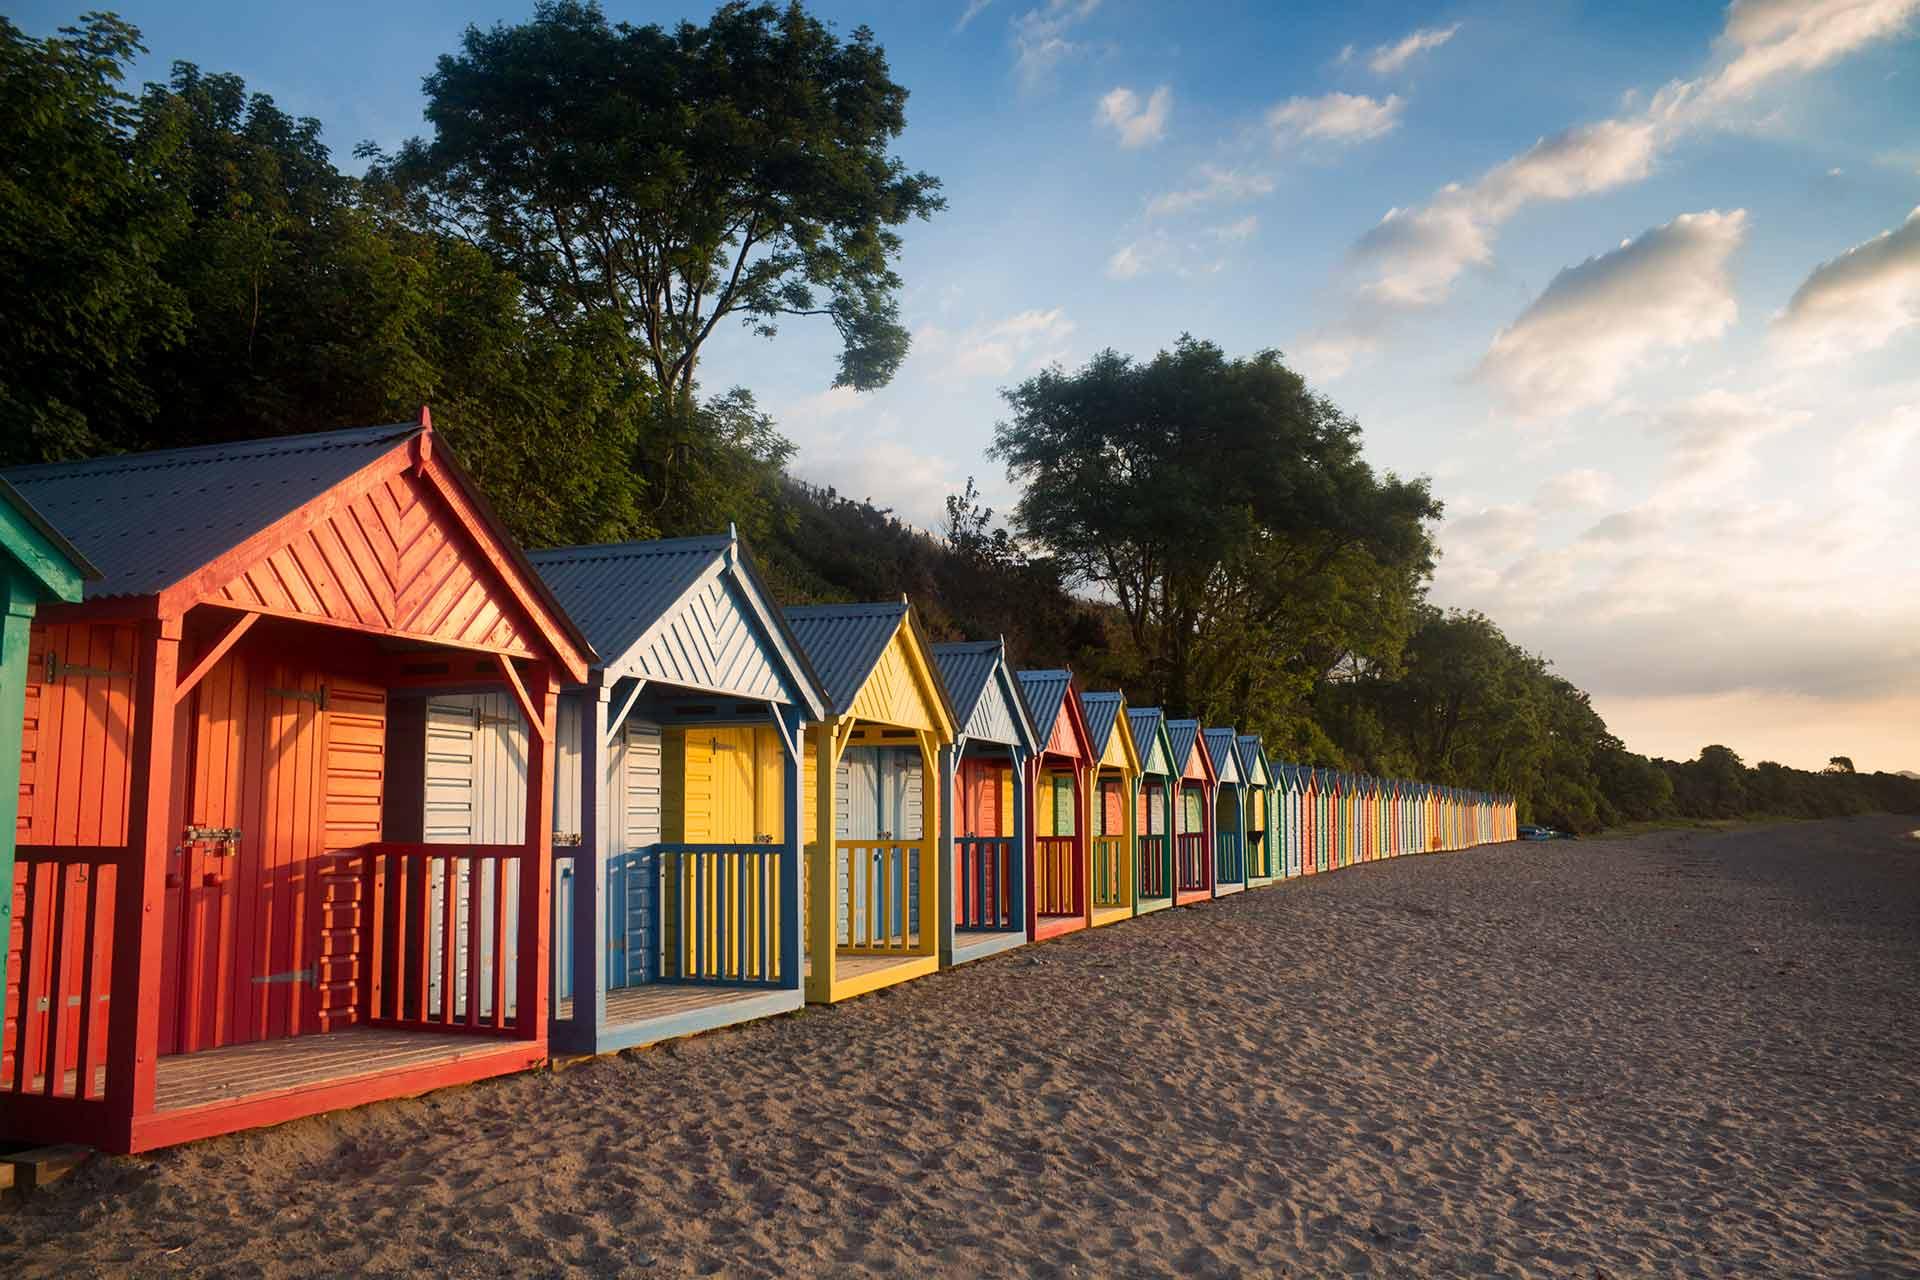 Llŷn Peninsula Beaches Image of beach huts at Llanbedrog Beach